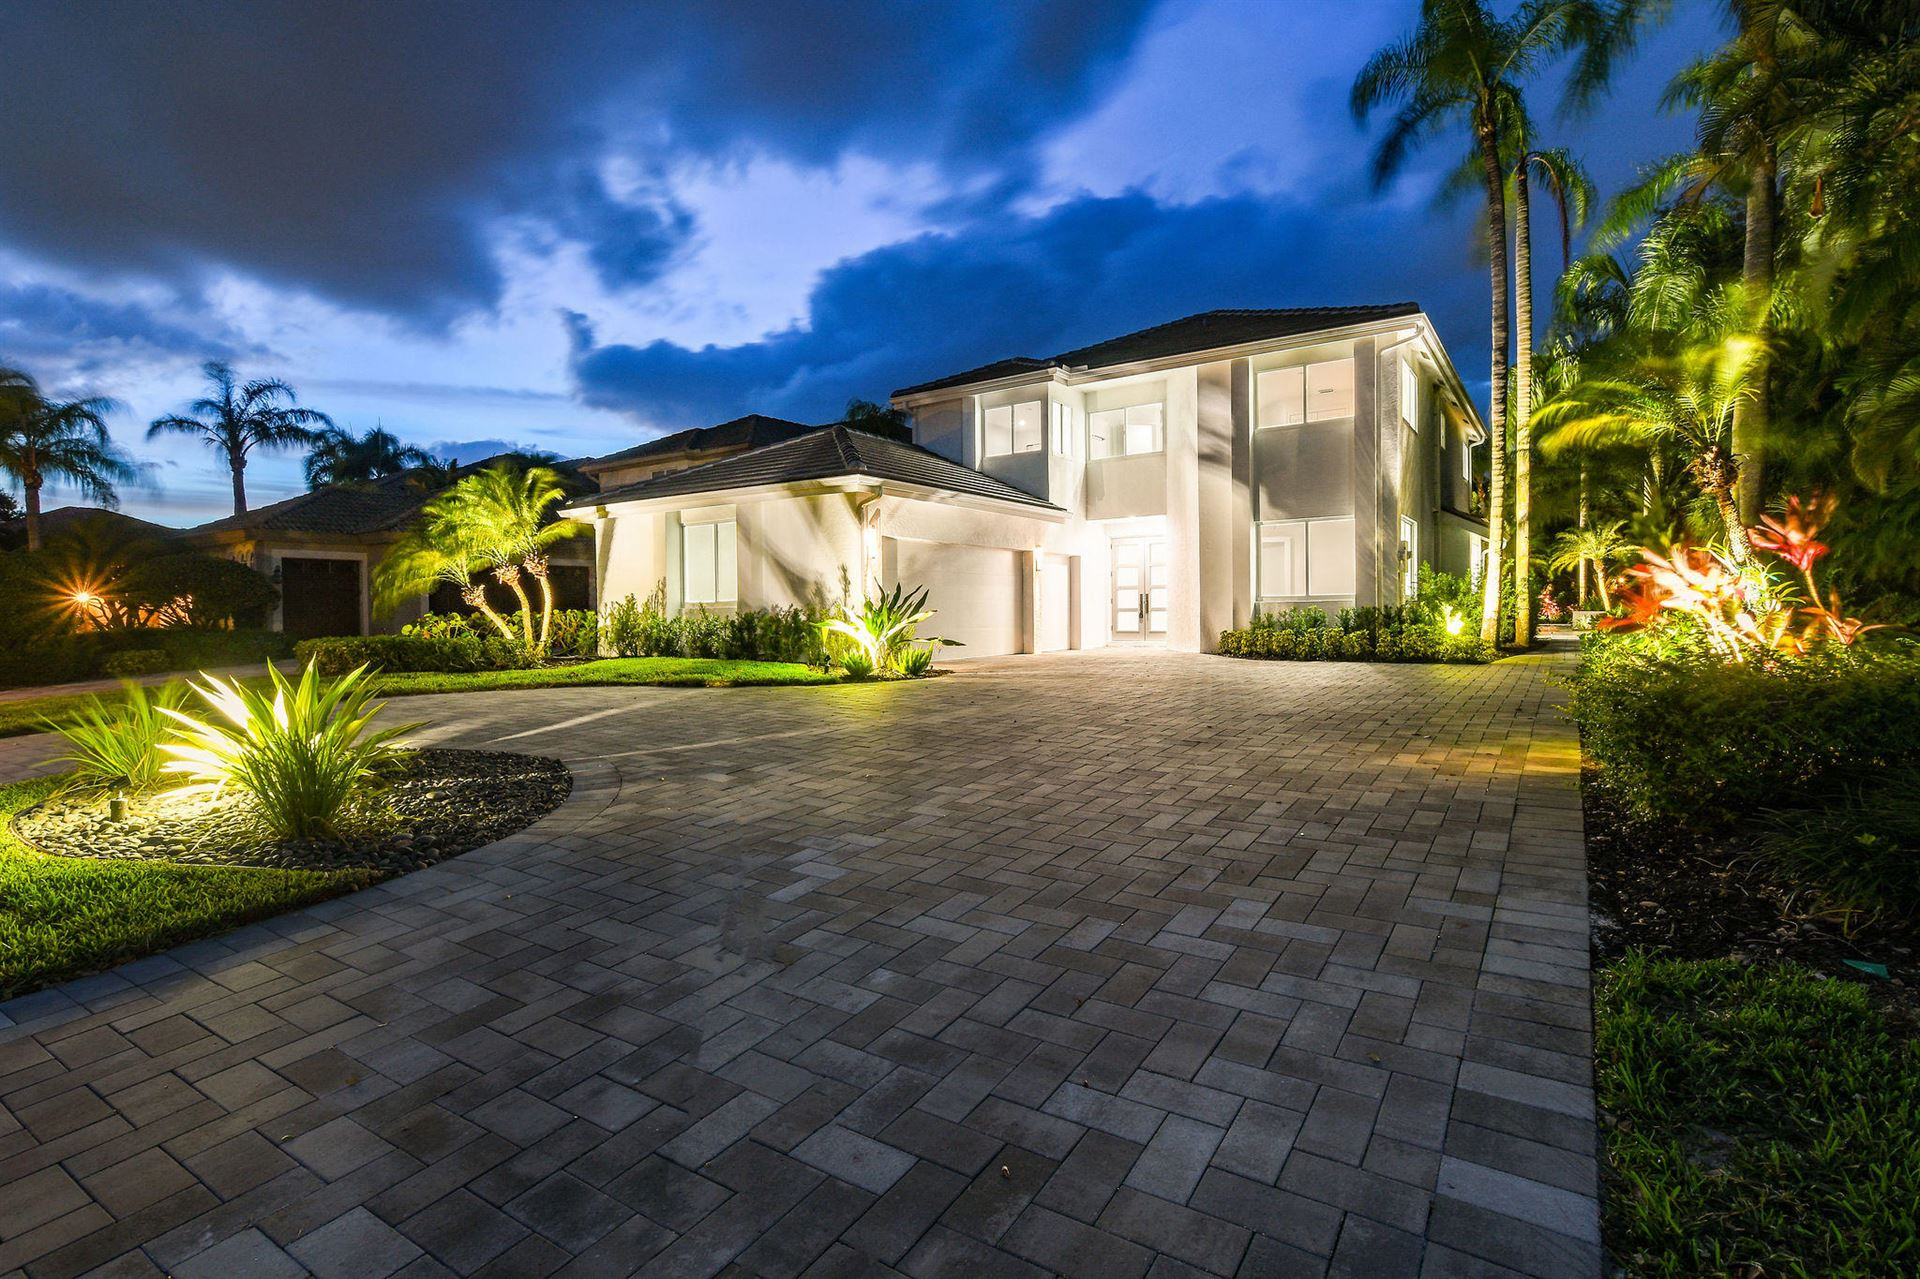 Photo of 3651 Toulouse Drive, Palm Beach Gardens, FL 33410 (MLS # RX-10645046)